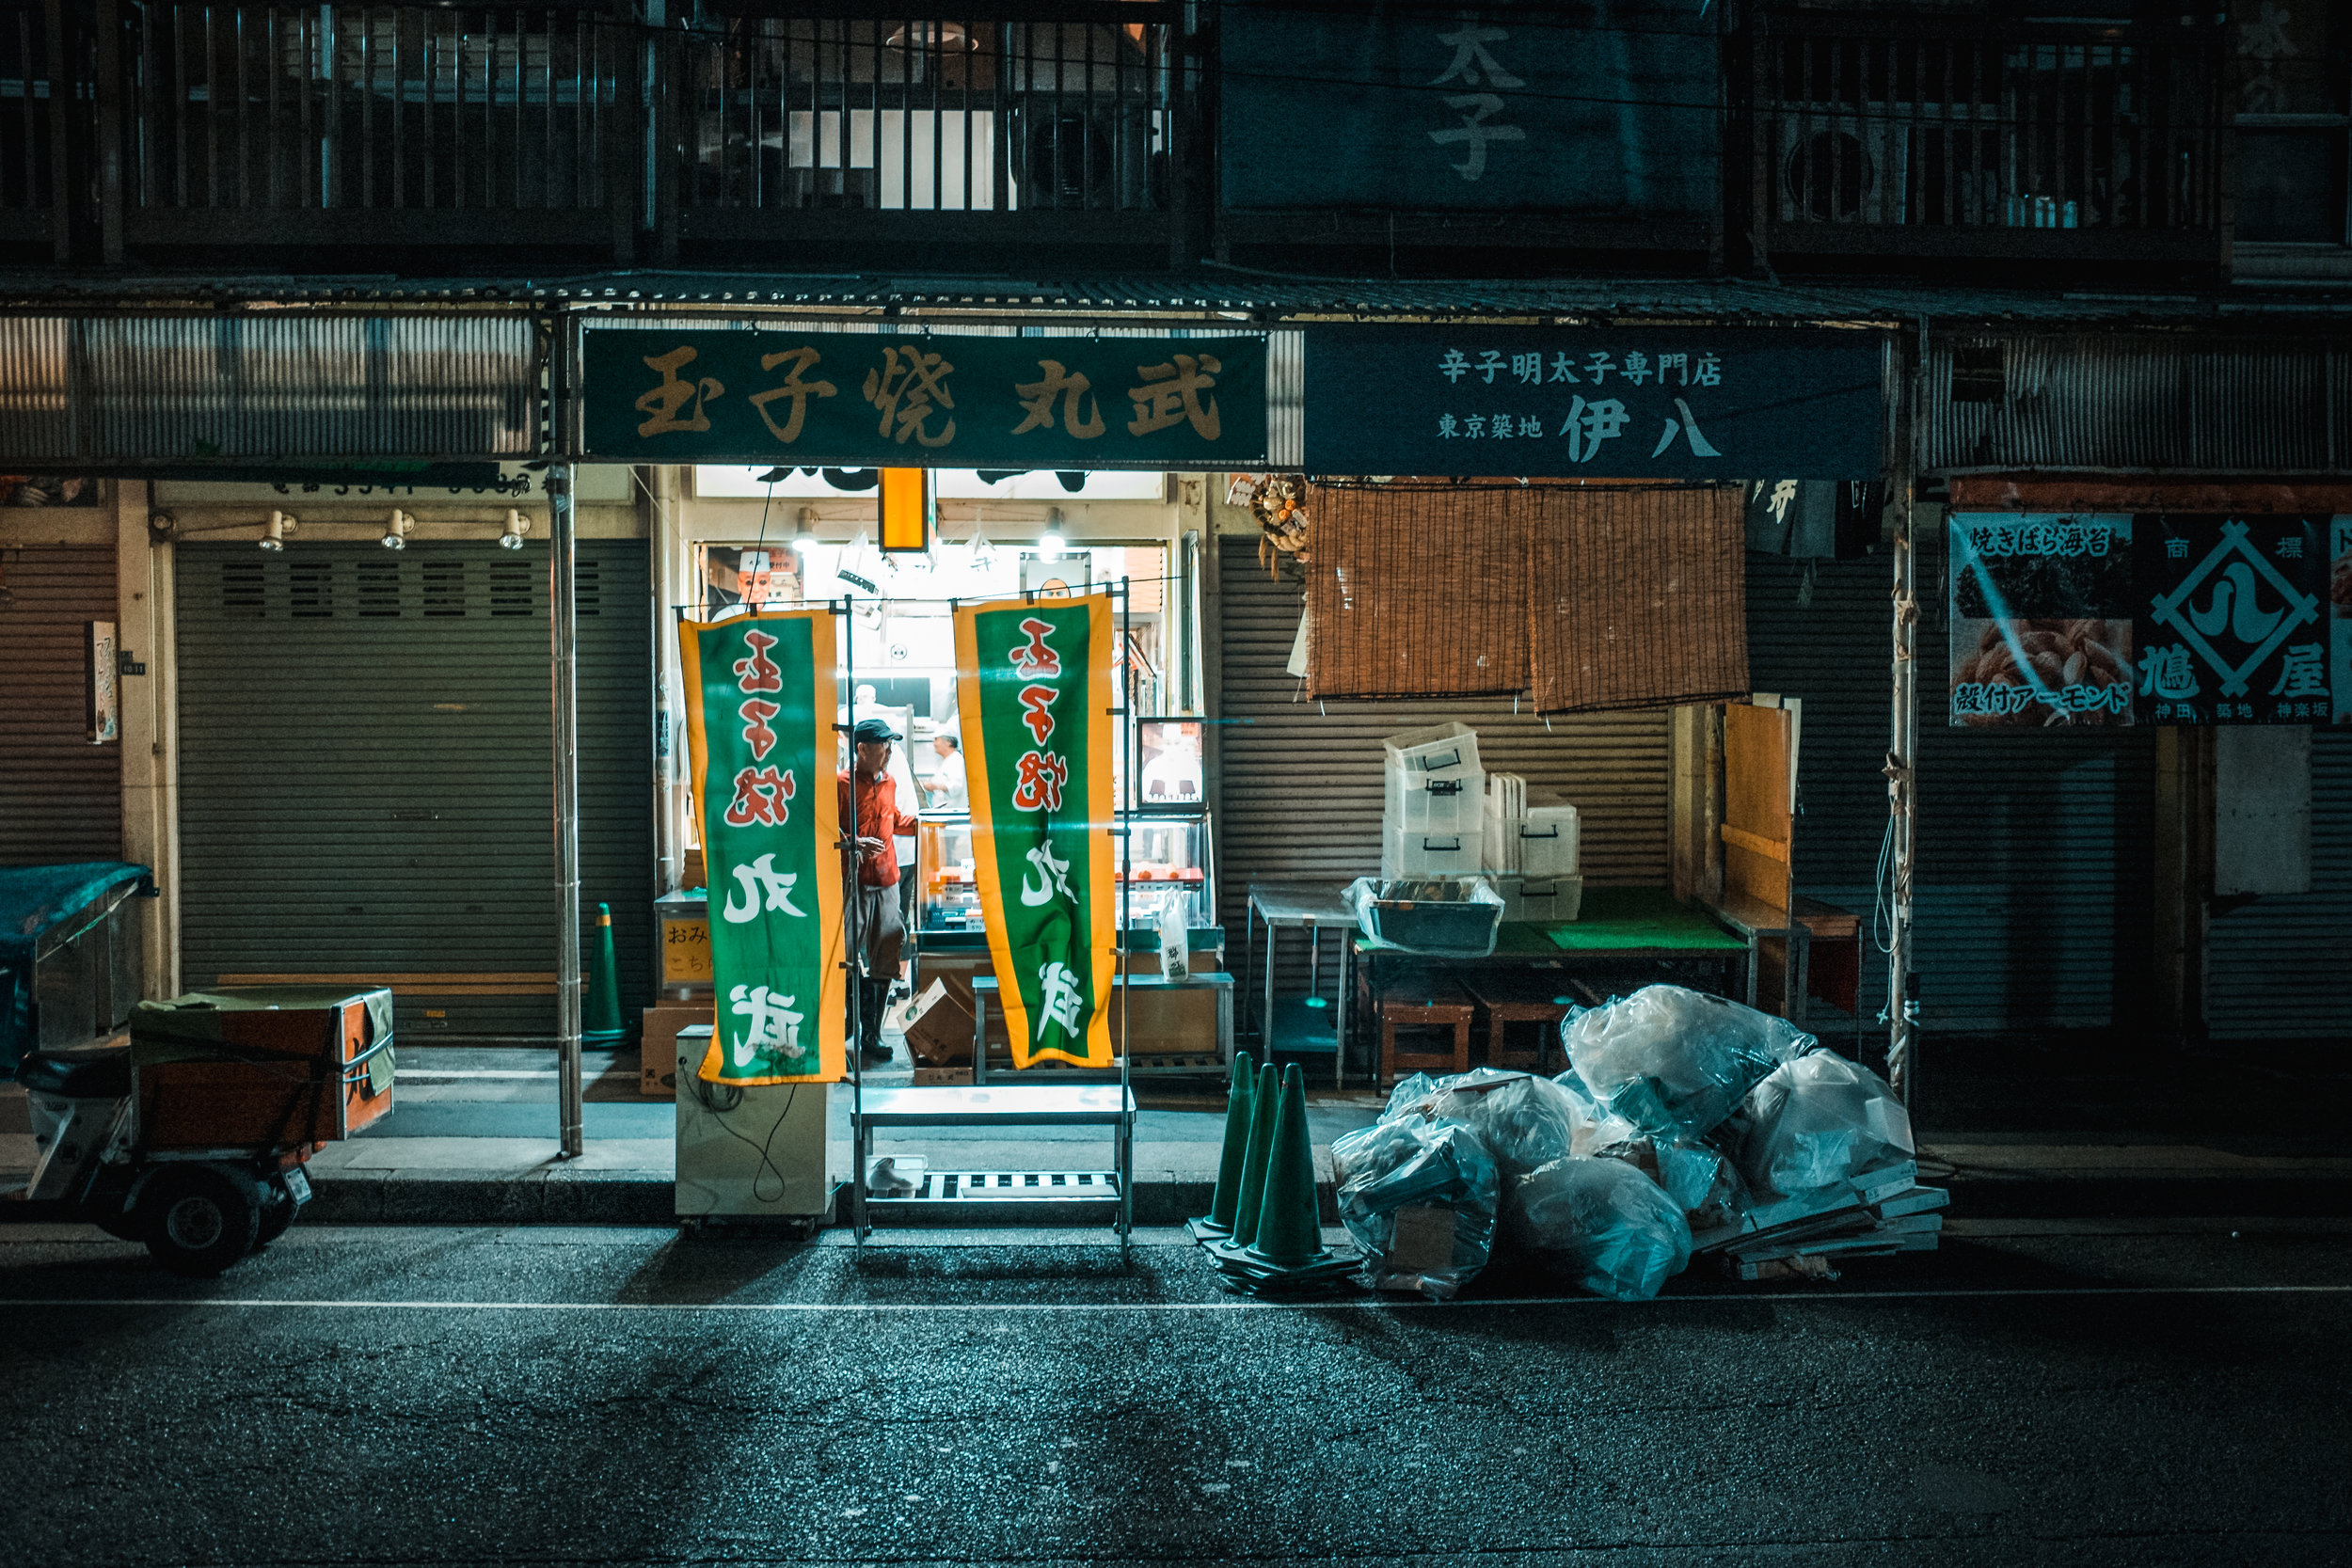 TokyoJapan_2018_AdamDillon_DSCF9126.jpg